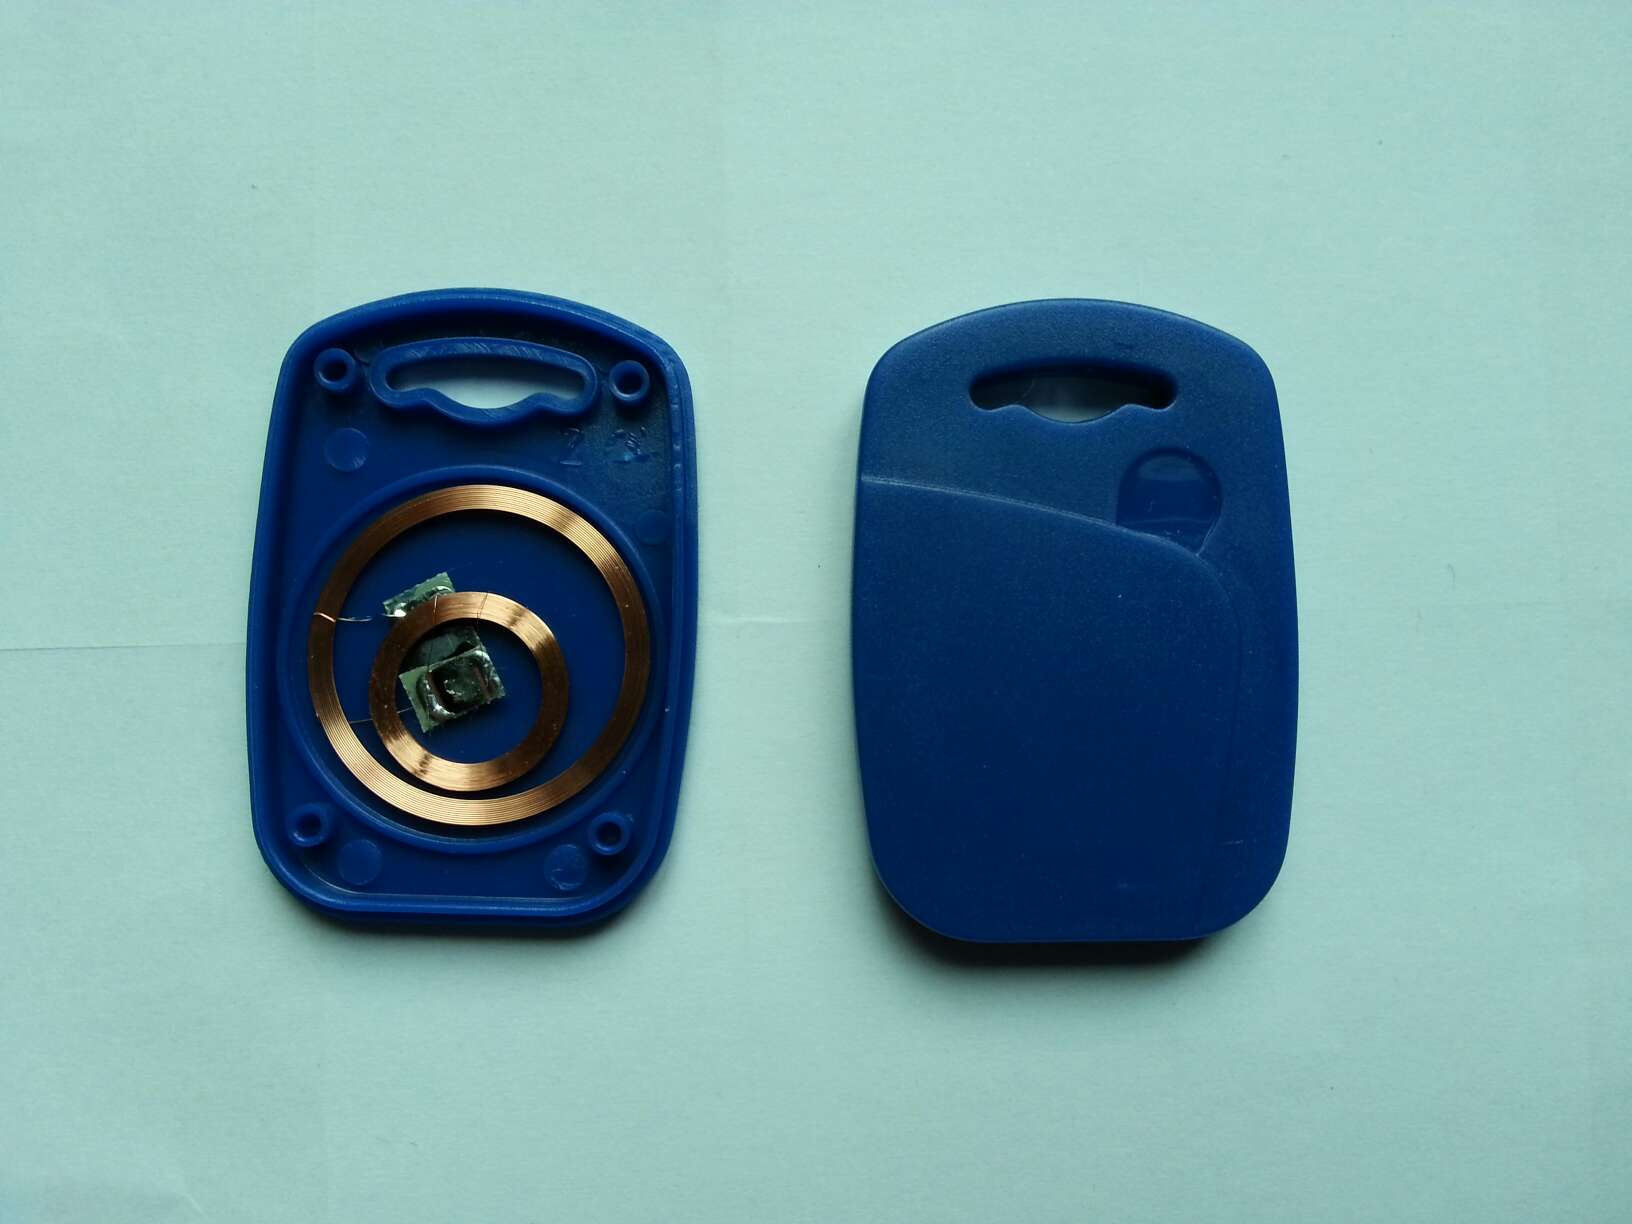 IC+ID UID Writable Composite Key Tags Keyfob 125KHZ T5577 RFID+13.56MHZ UID 1K Changeable NFC 50pcs lot uid changeable nfc ic tag rfid keyfob token 1k s50 13 56mhz writable iso14443a